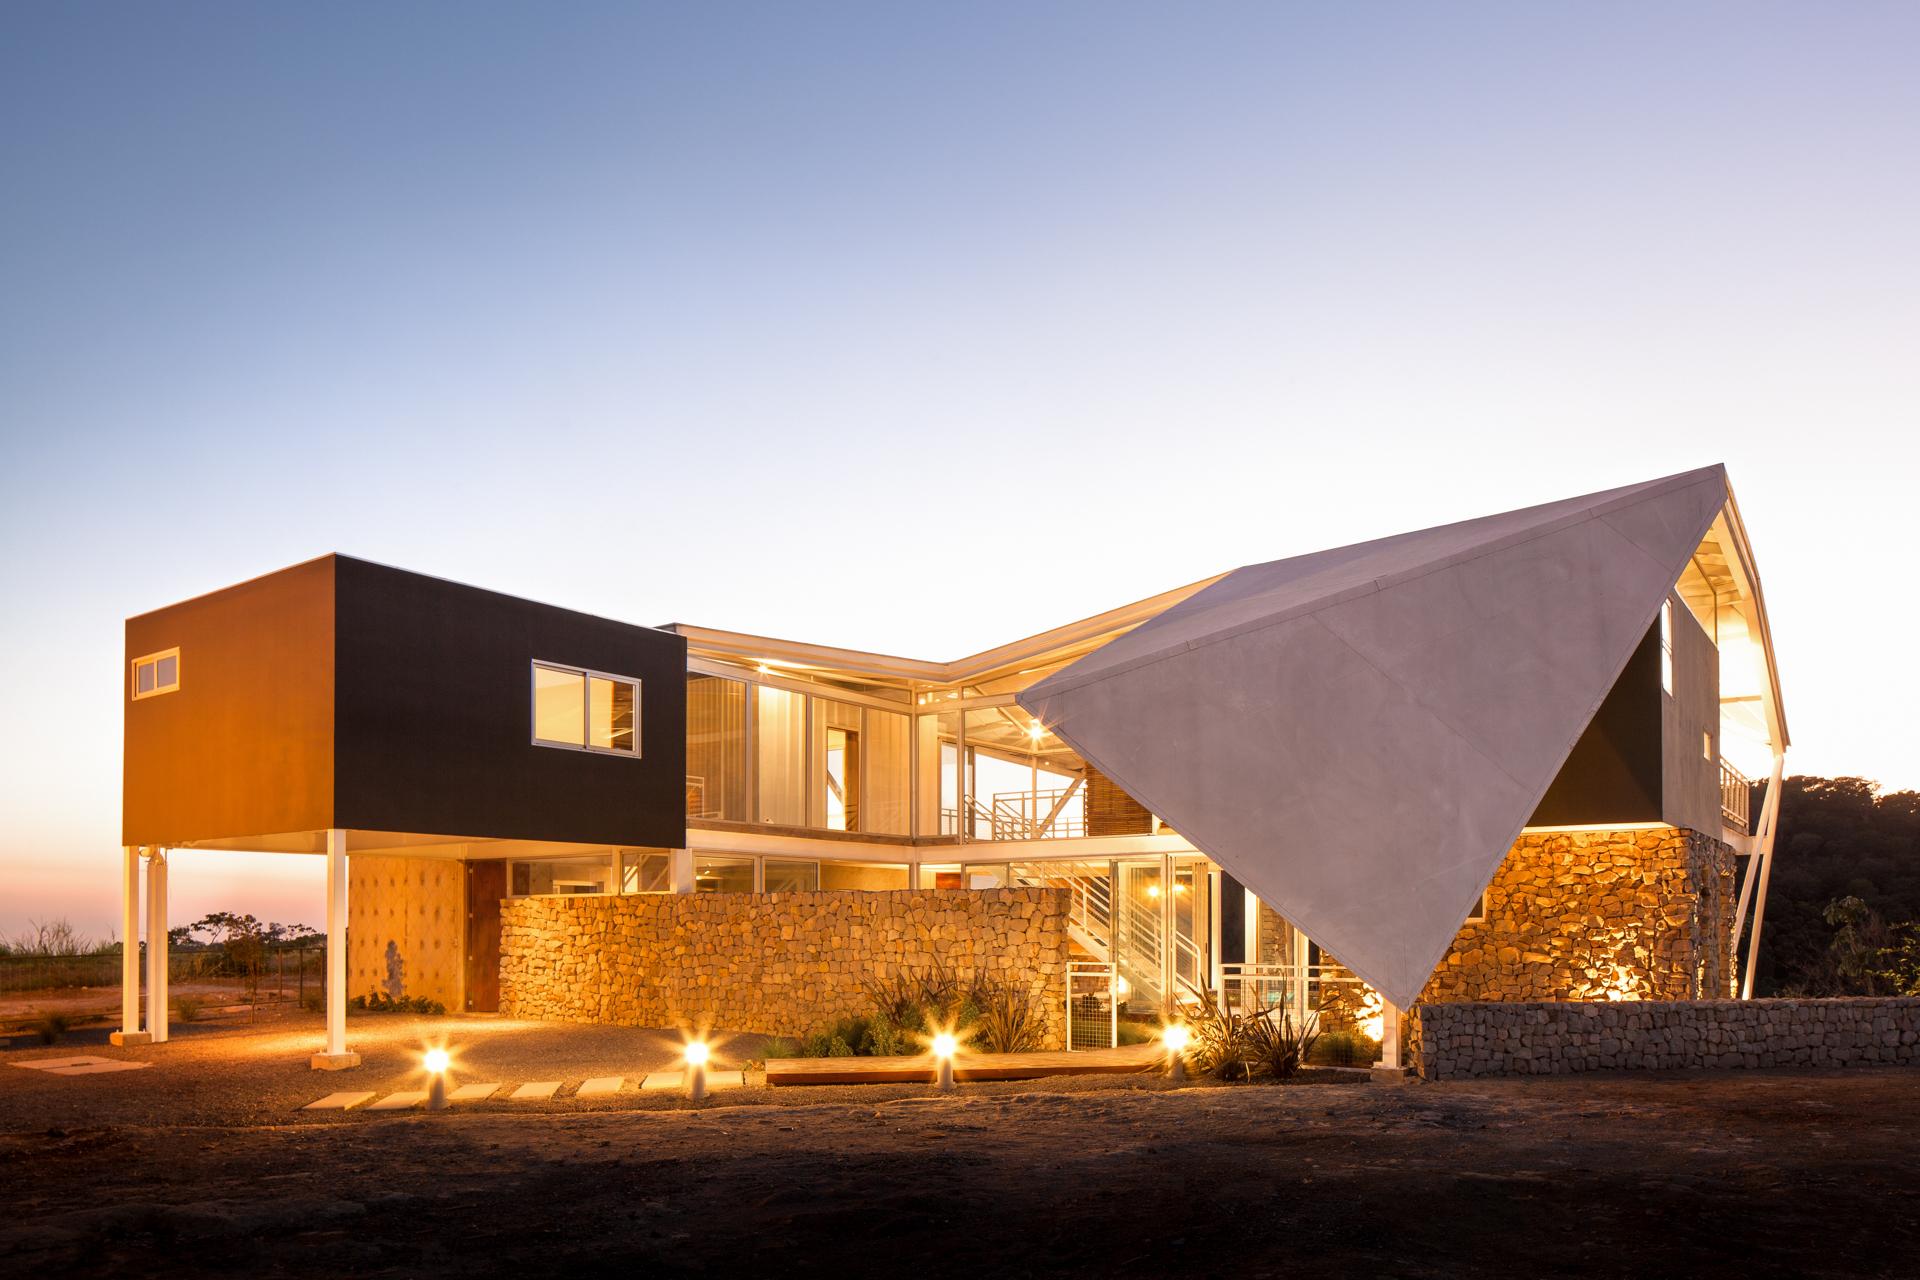 Architecture-Jason-Bax-100036.JPG